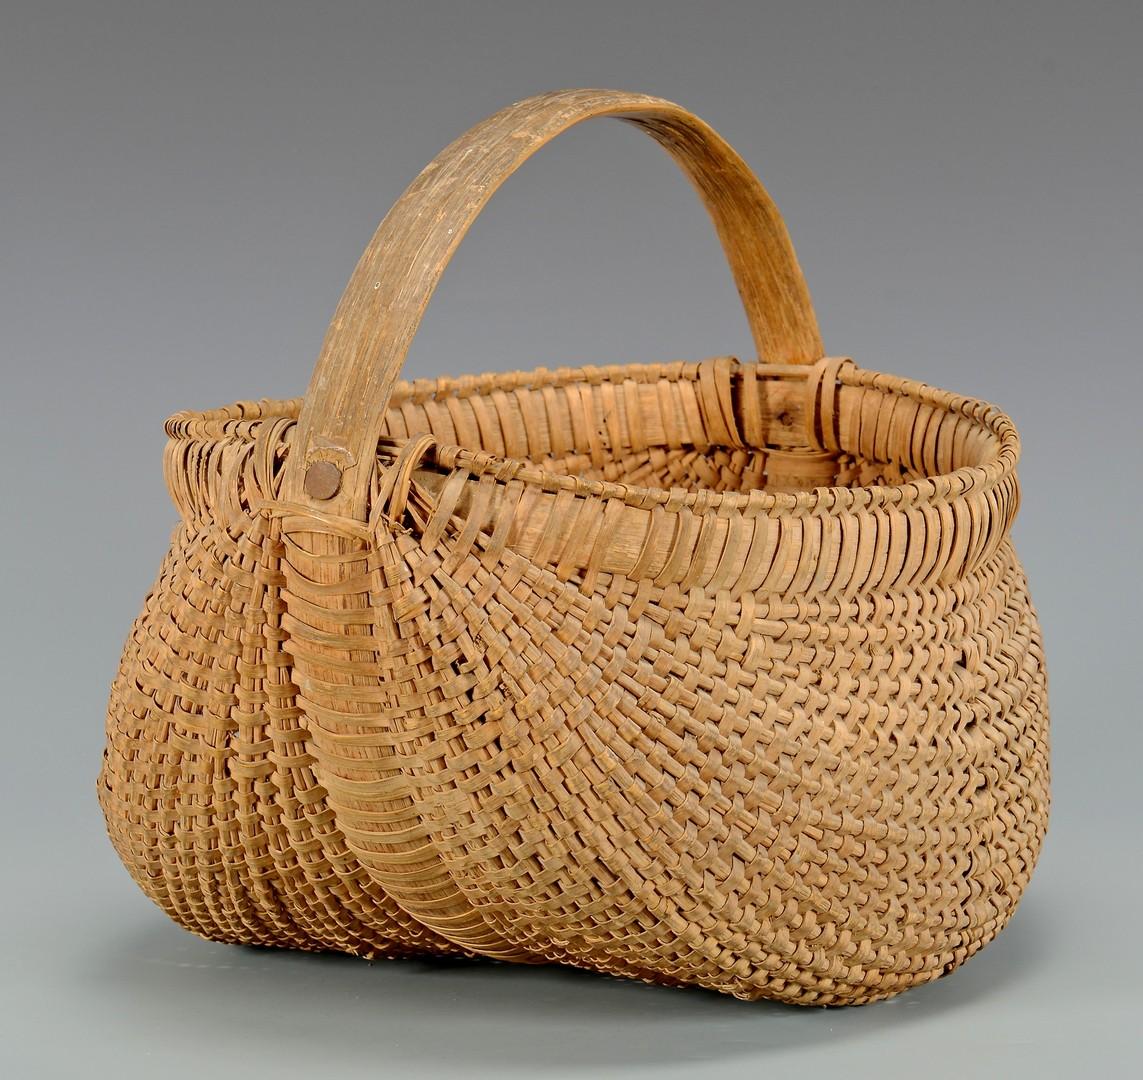 Lot 266: 3 East TN Buttocks Baskets